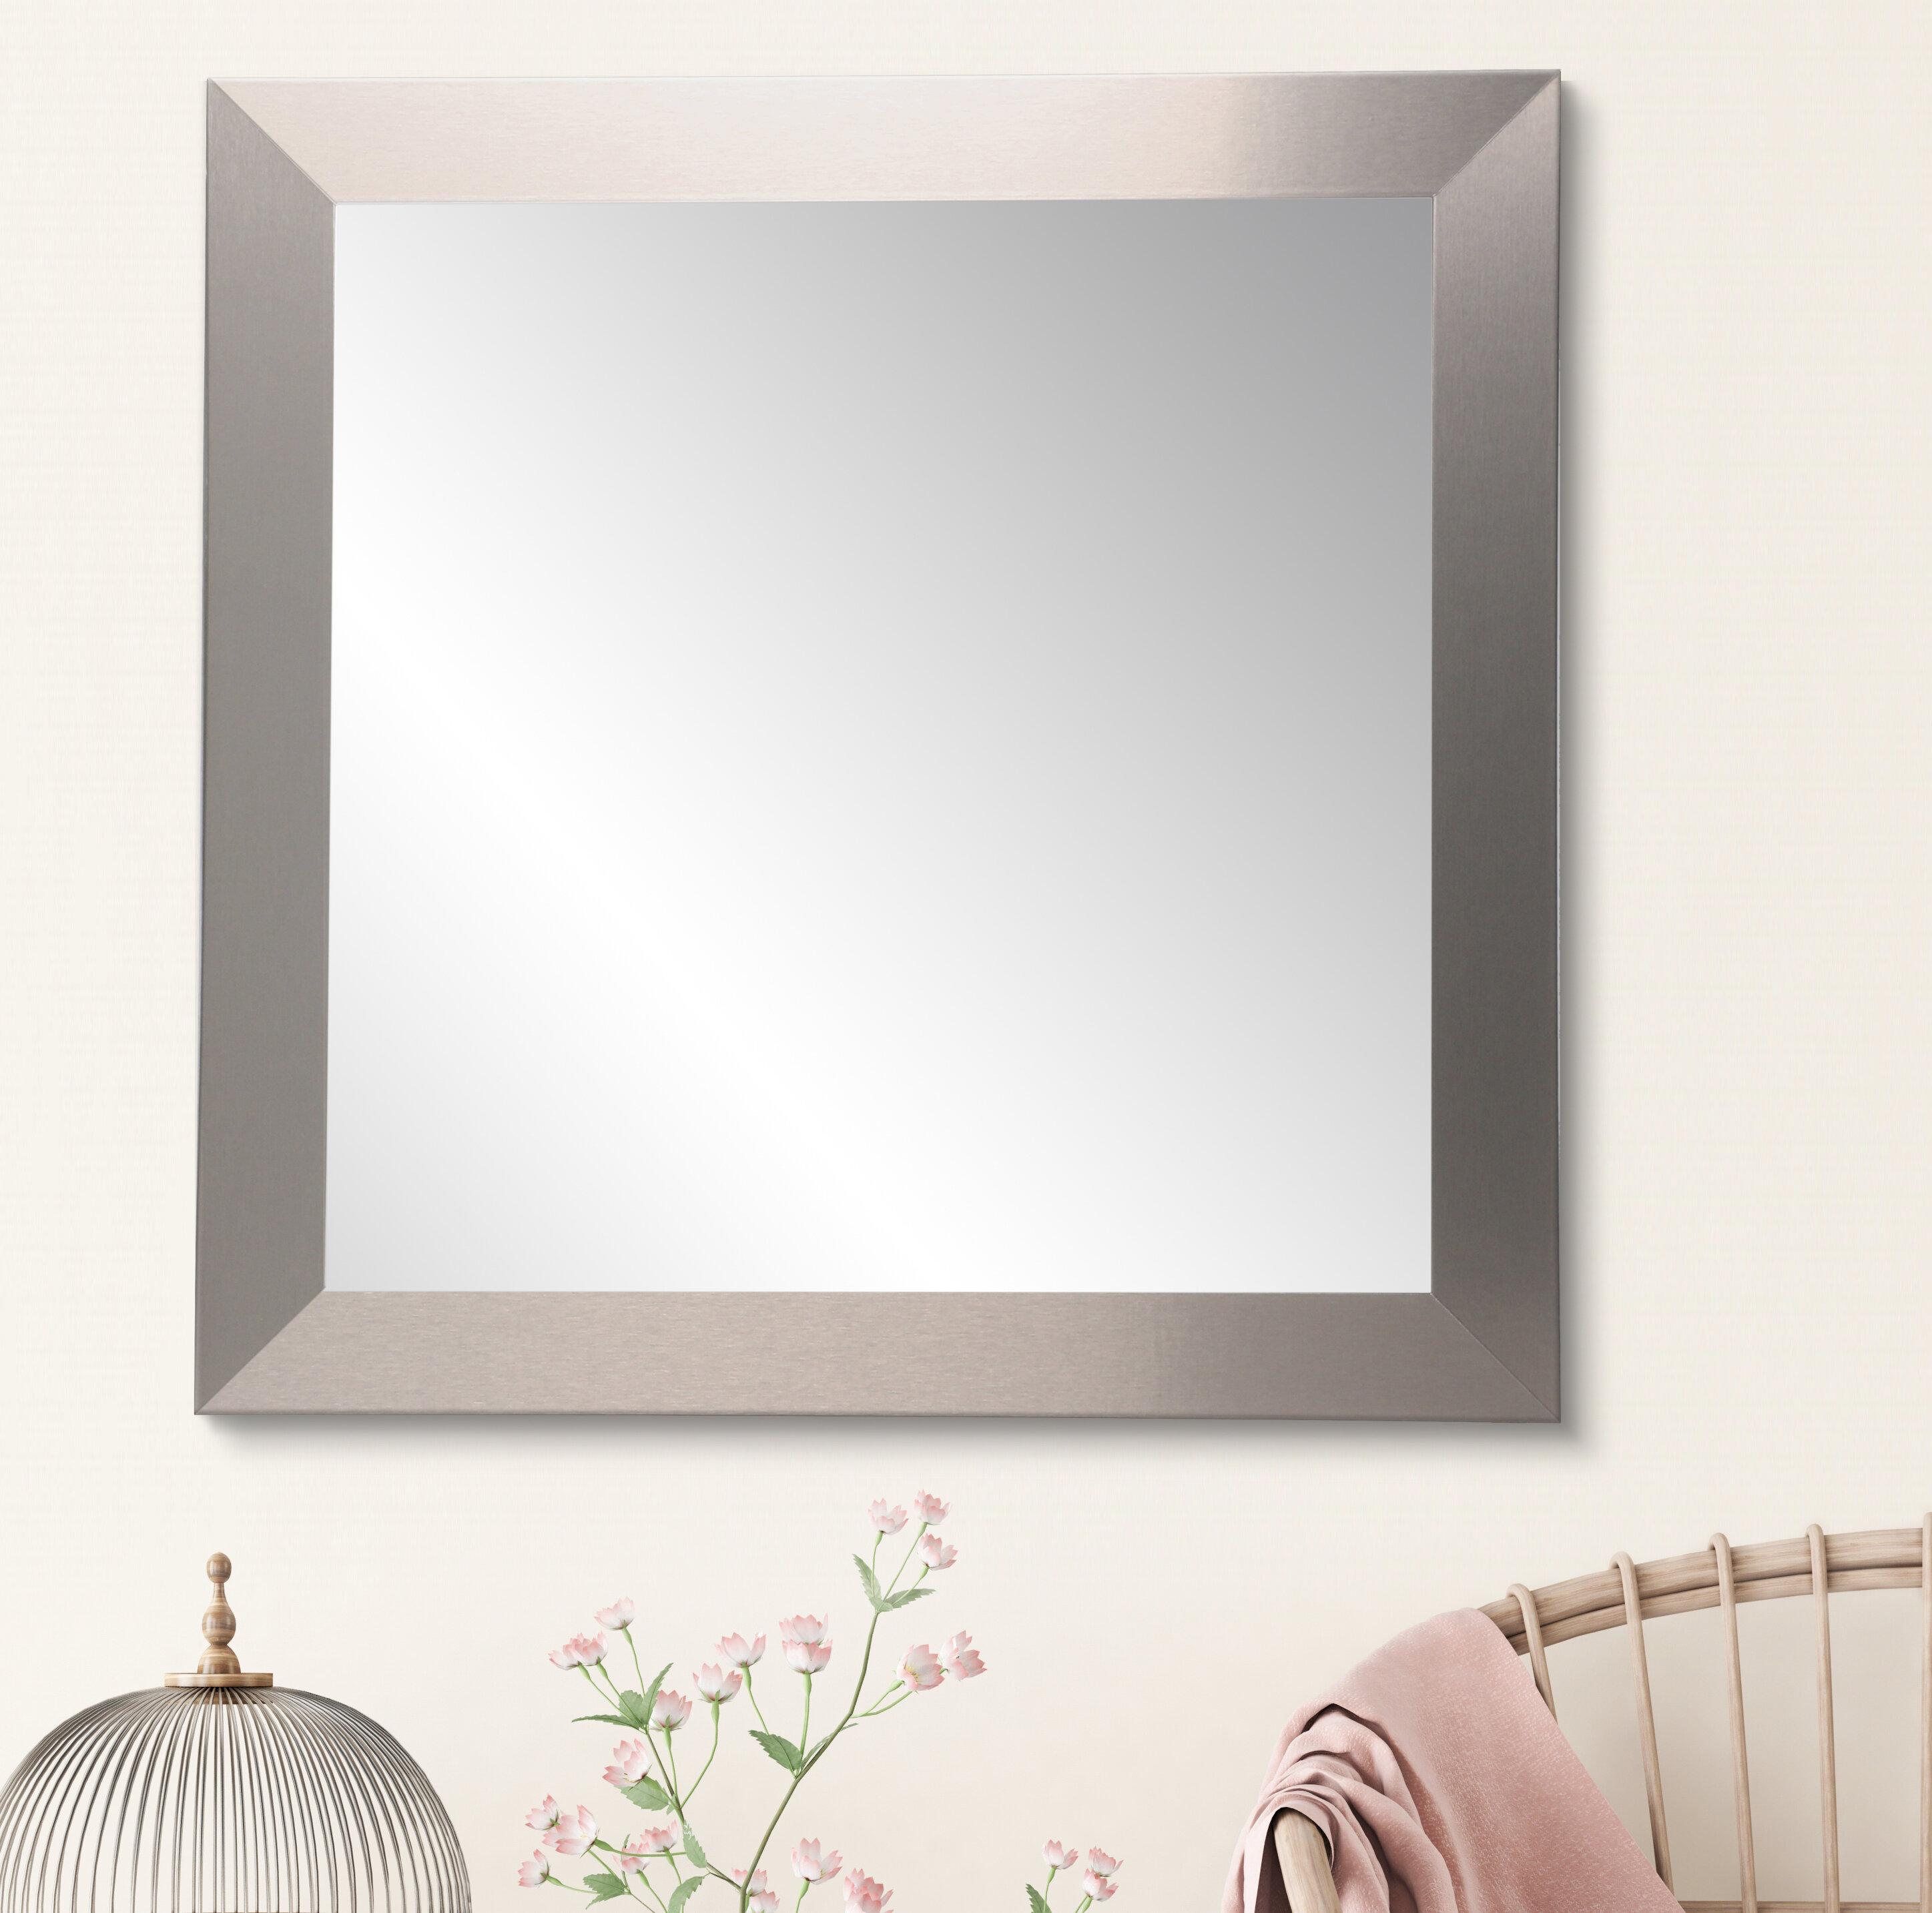 Orren Ellis Reilly Home Accent Wall Mirror